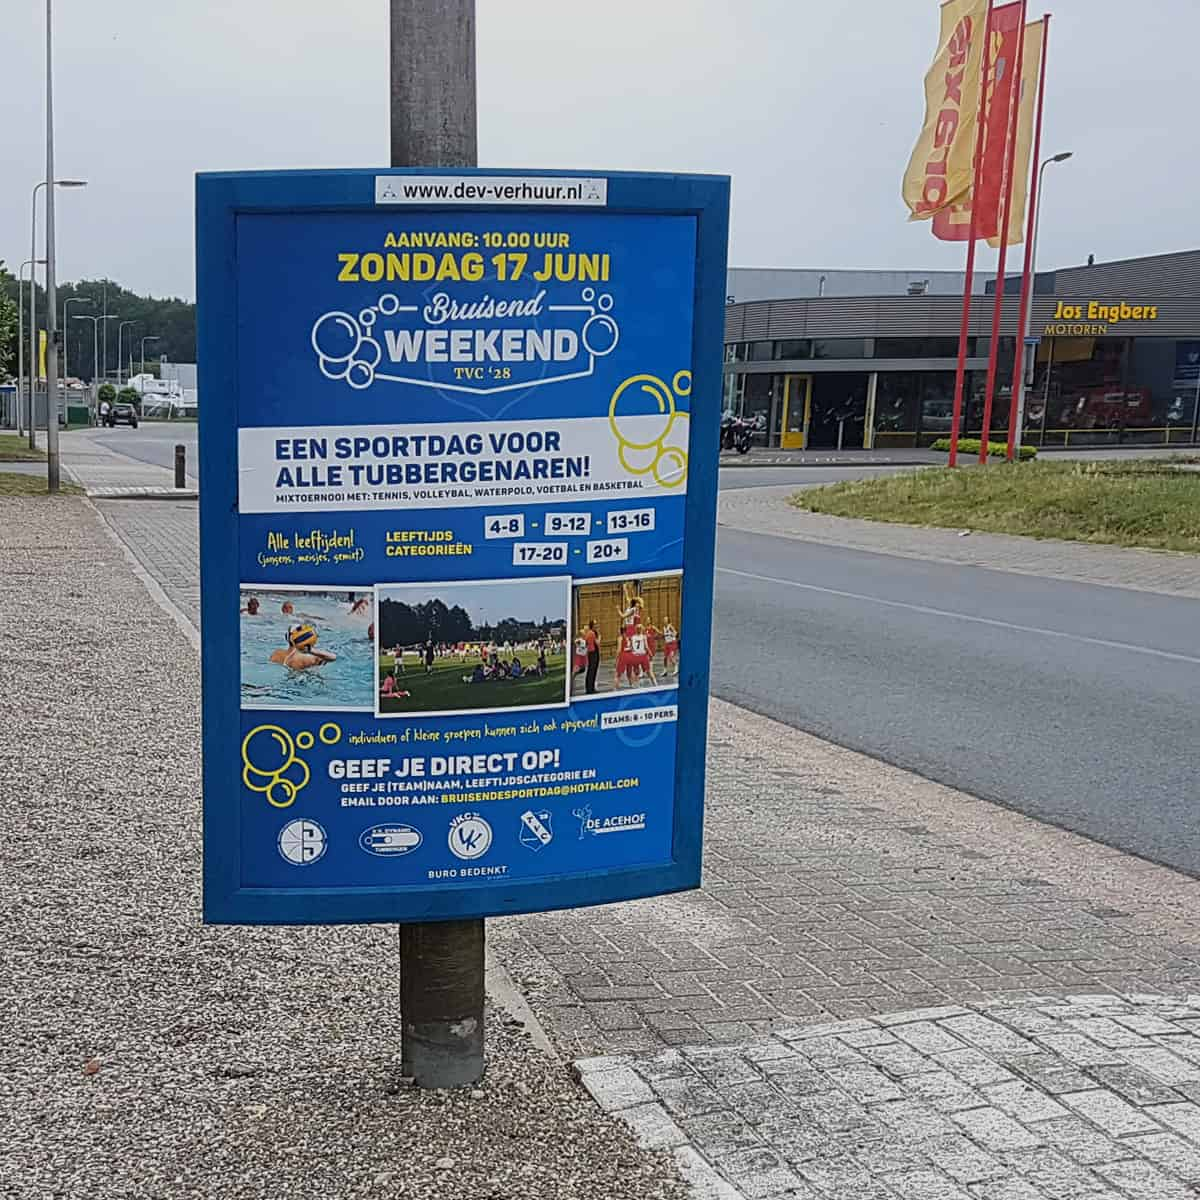 A0-poster-mockup-tvc28-bruisend-weekend-burobedenkt